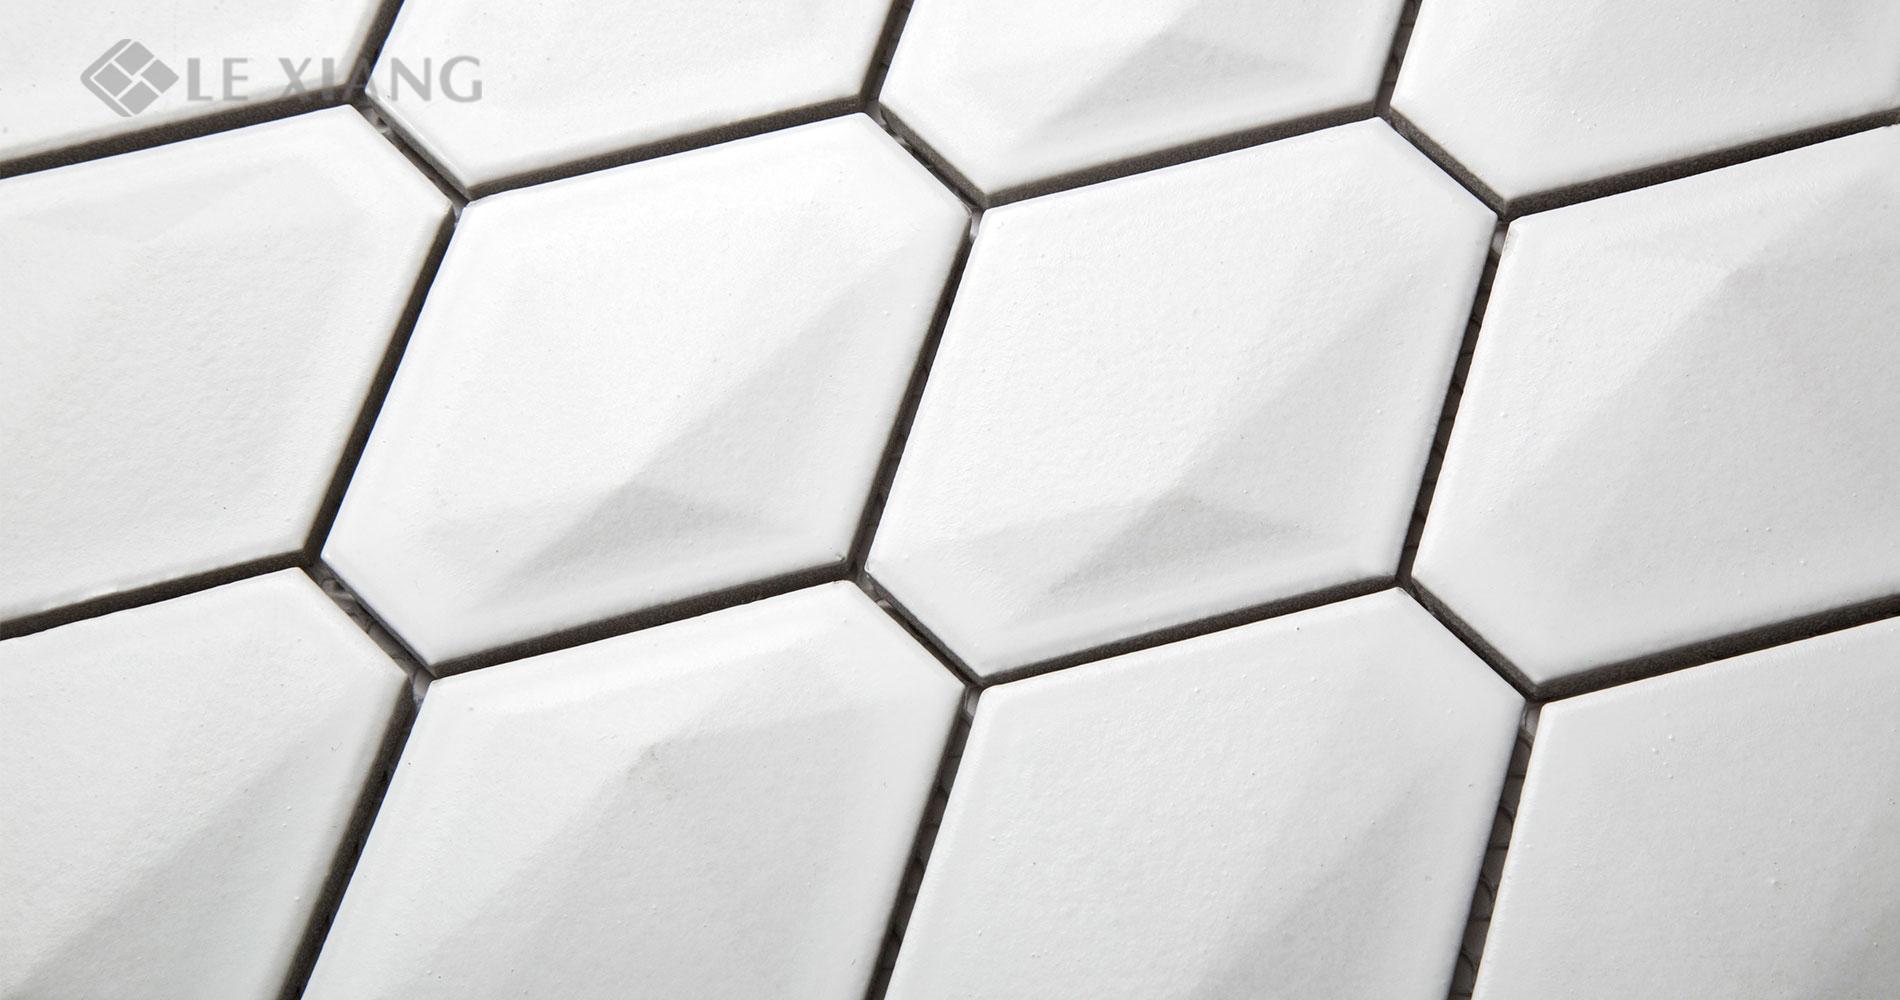 Porcelain-Hexagon-Mosaic-Tile-For-Bathroom-Wall-Flooring-Tiles-10